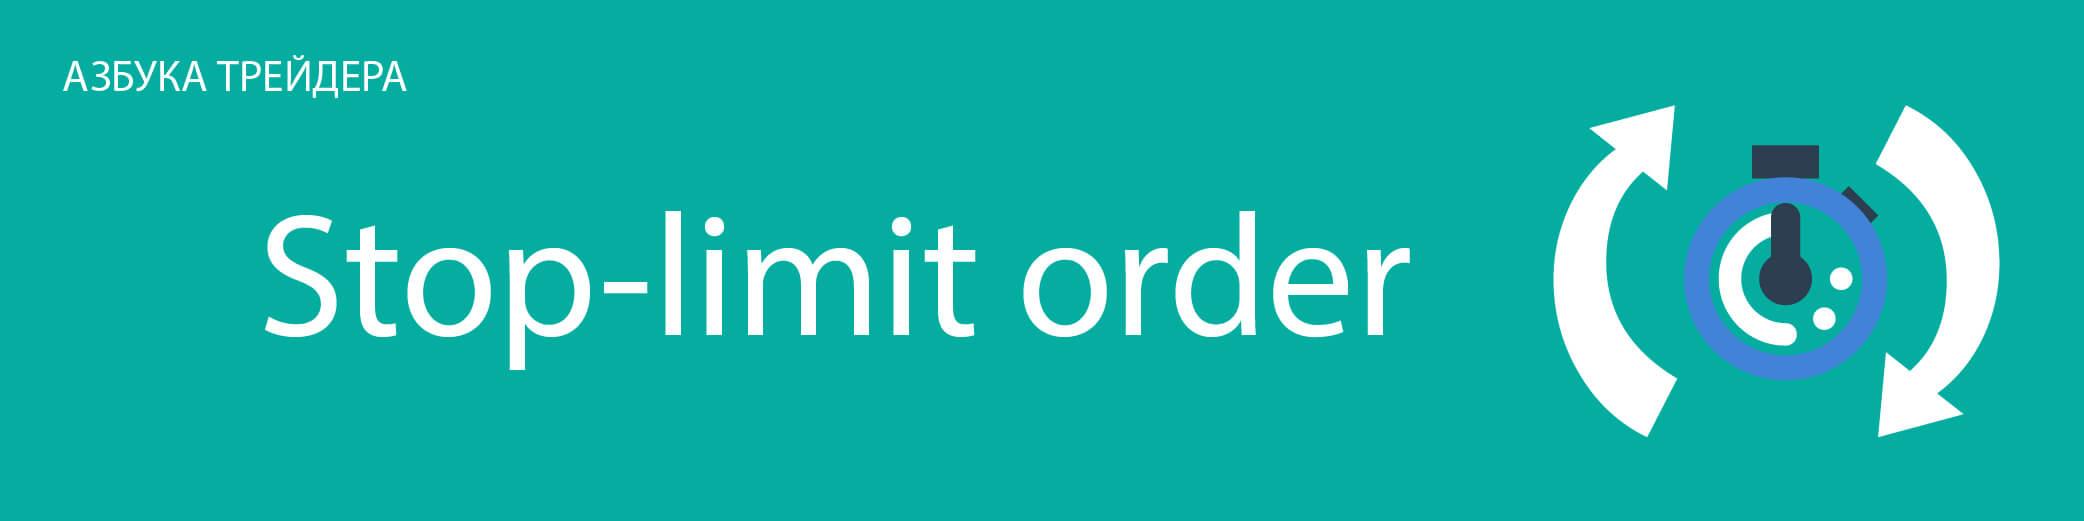 stop-limit-order